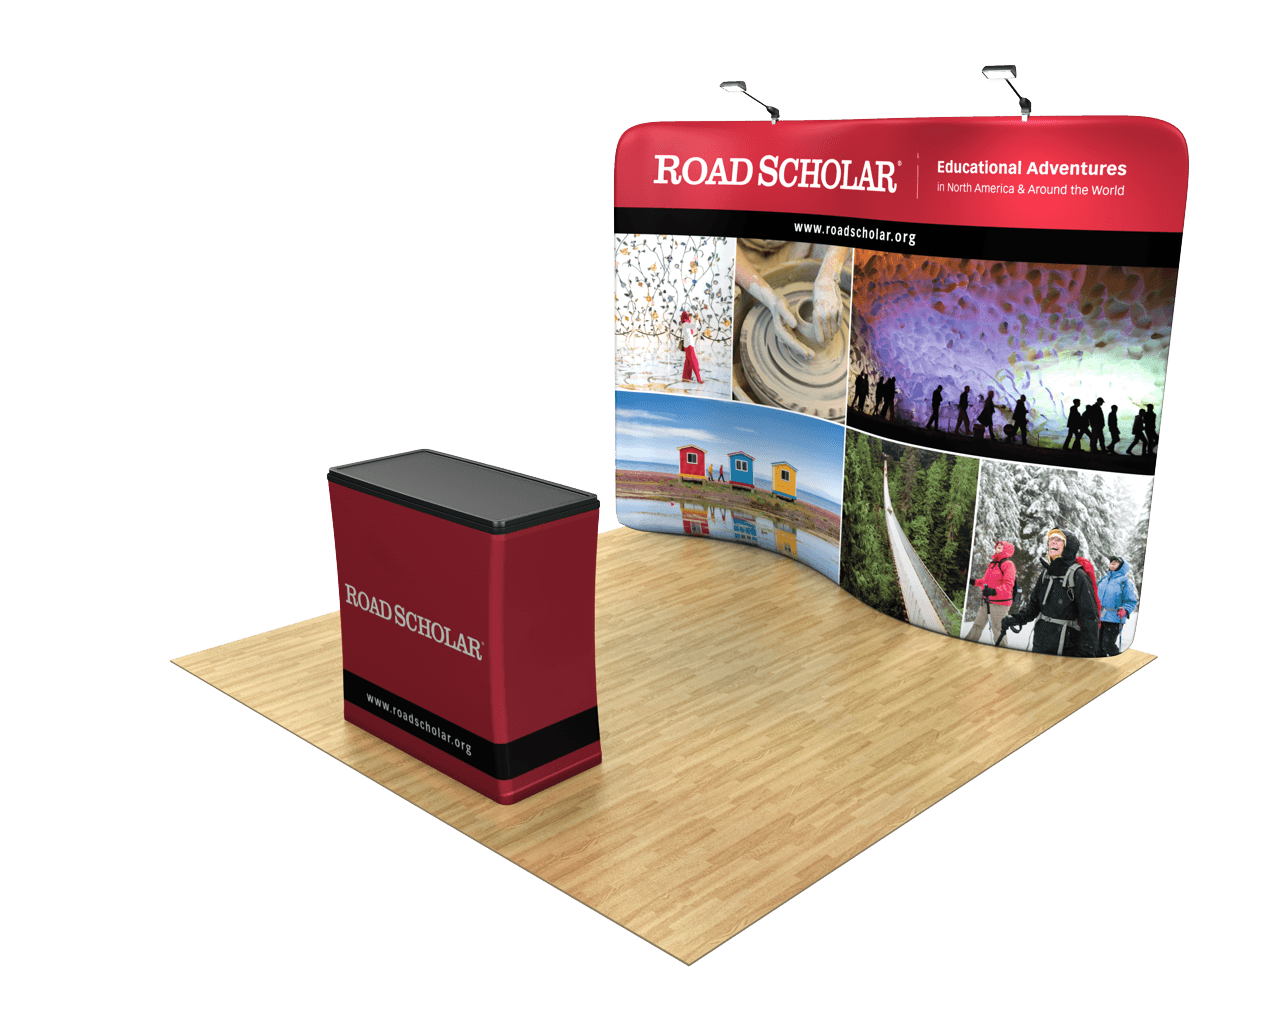 Waveline Serpentine 10ft Trade Show Display Kit